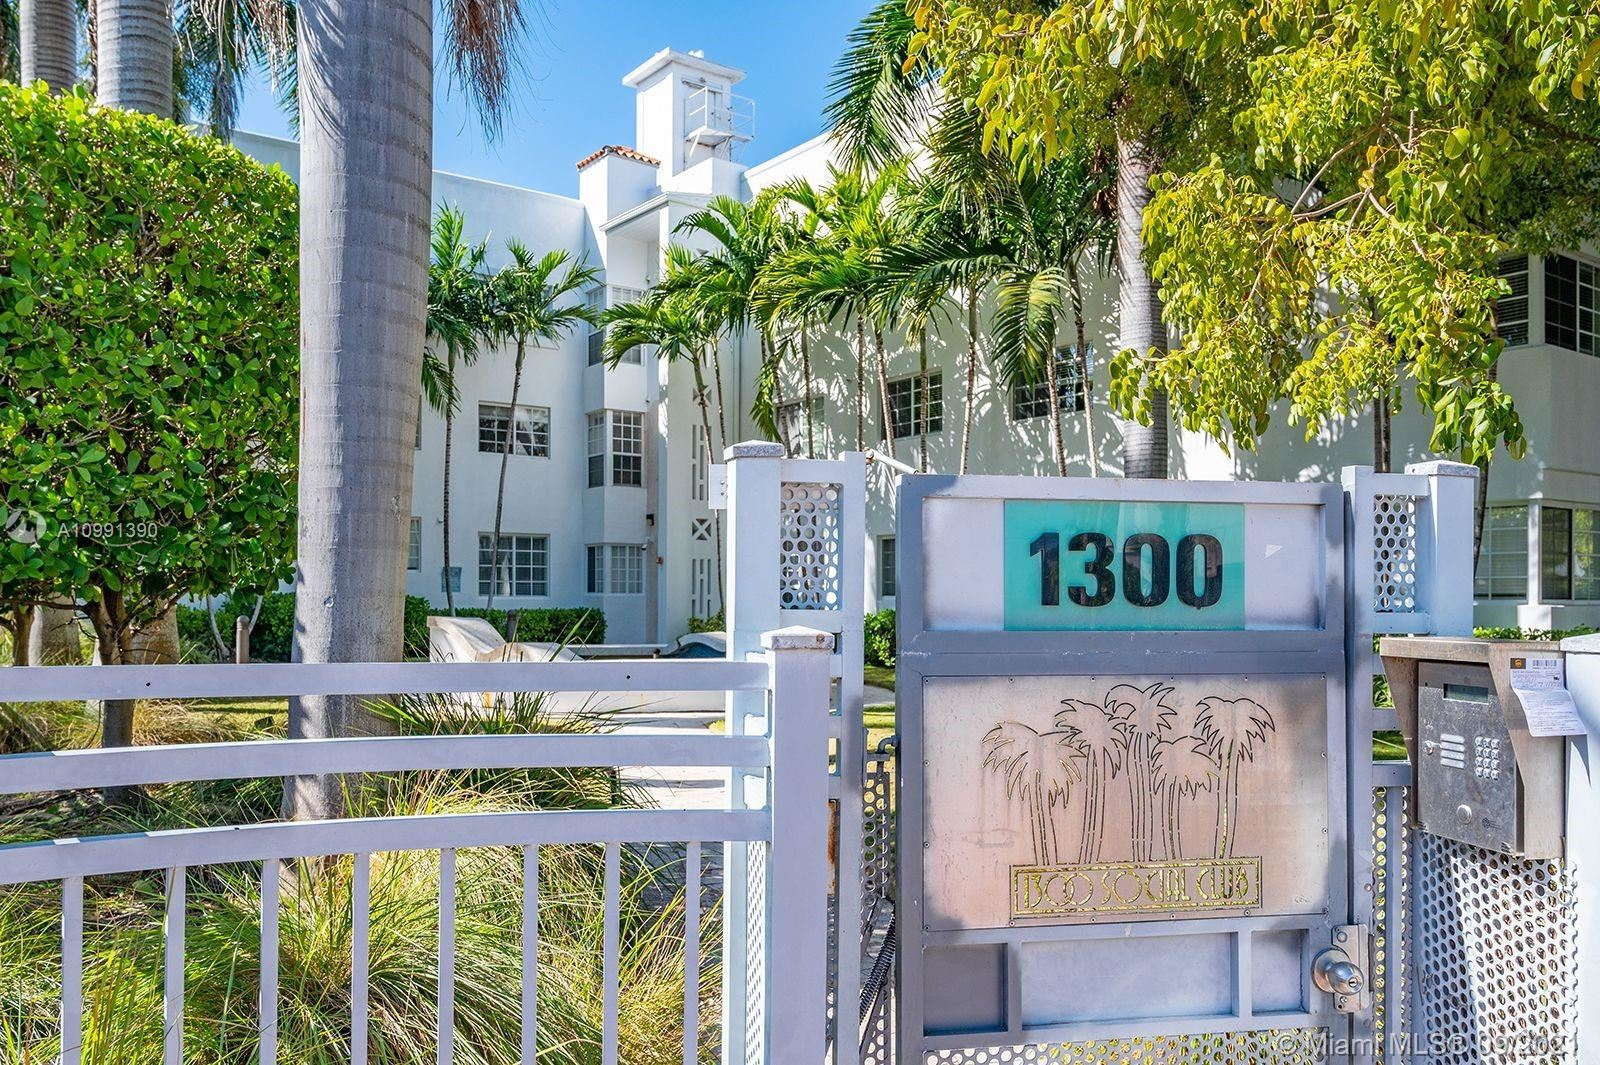 1300 Pennsylvania Ave #104, Miami Beach, FL 33139 - #: A10991390